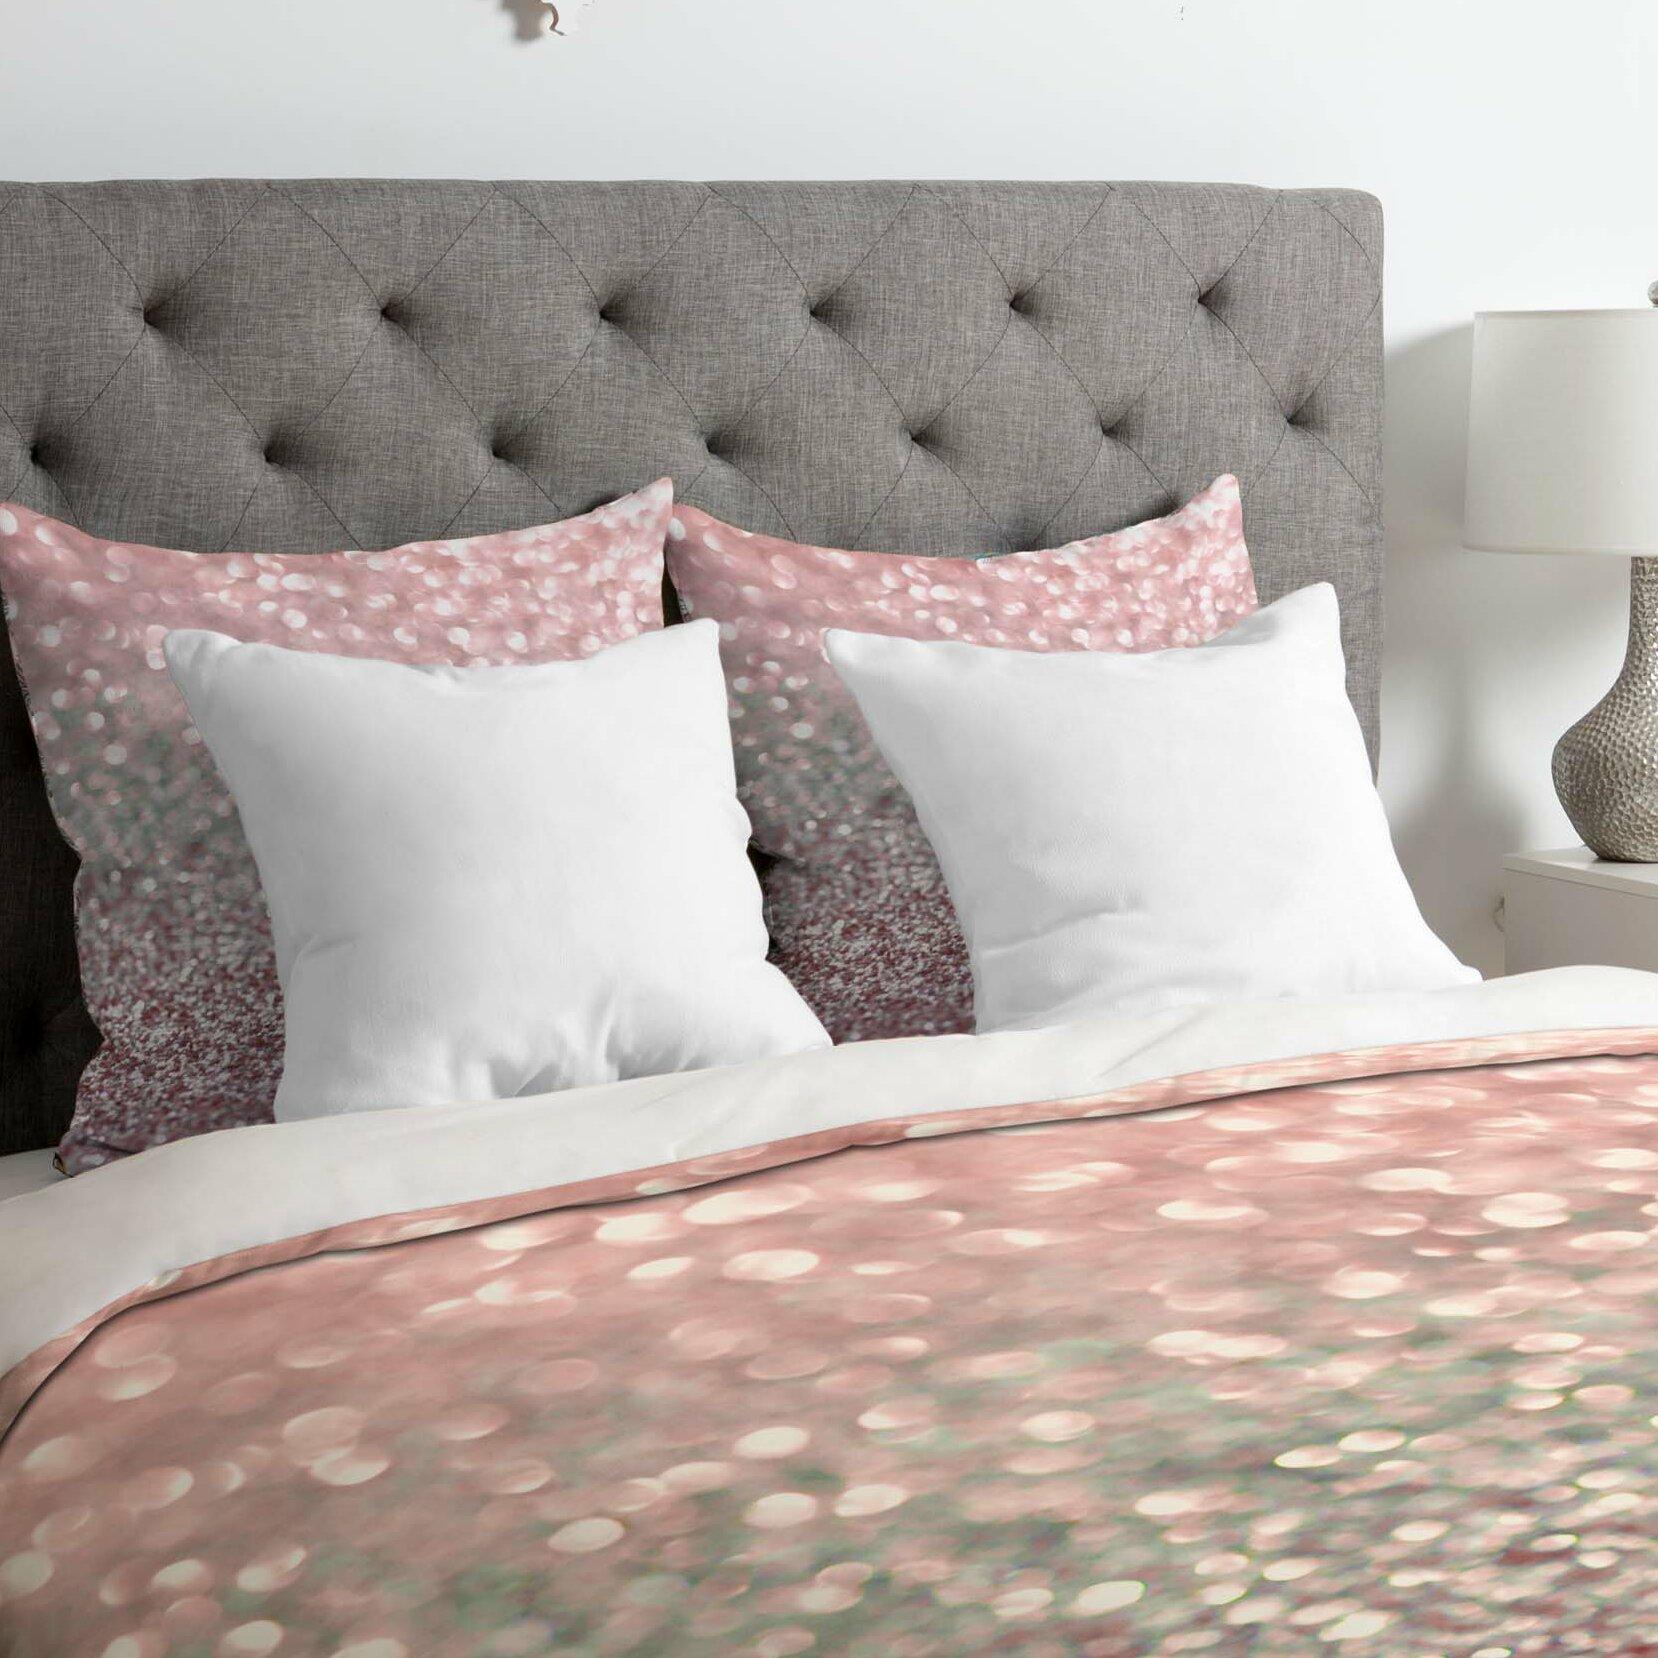 belgian elm dyed products west linen m flax pool shams light cover duvet fiber